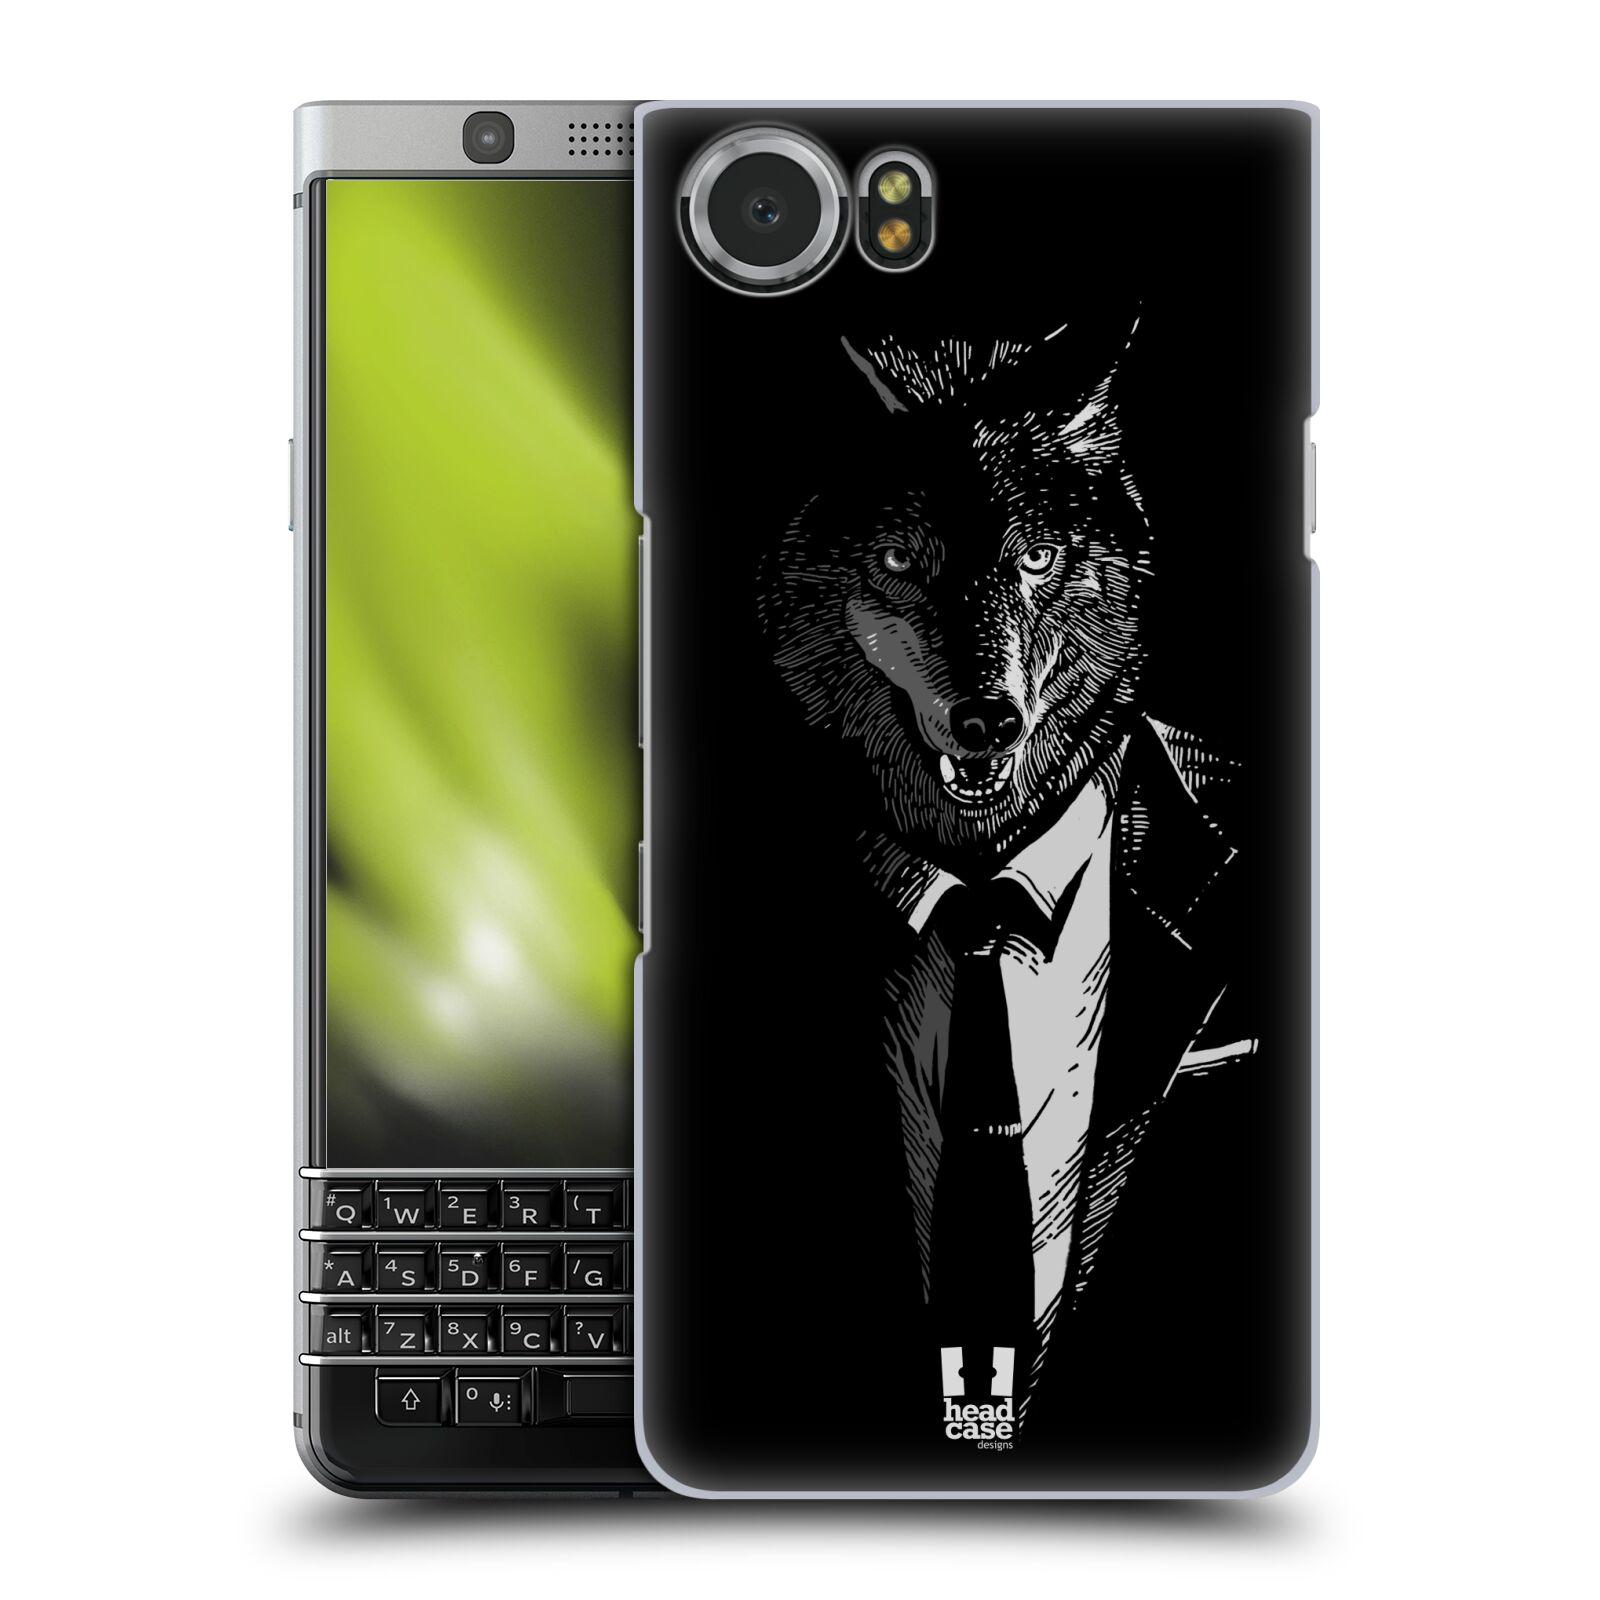 HEAD-CASE-DESIGNS-CLASSY-ANIMALS-HARD-BACK-CASE-FOR-BLACKBERRY-PHONES